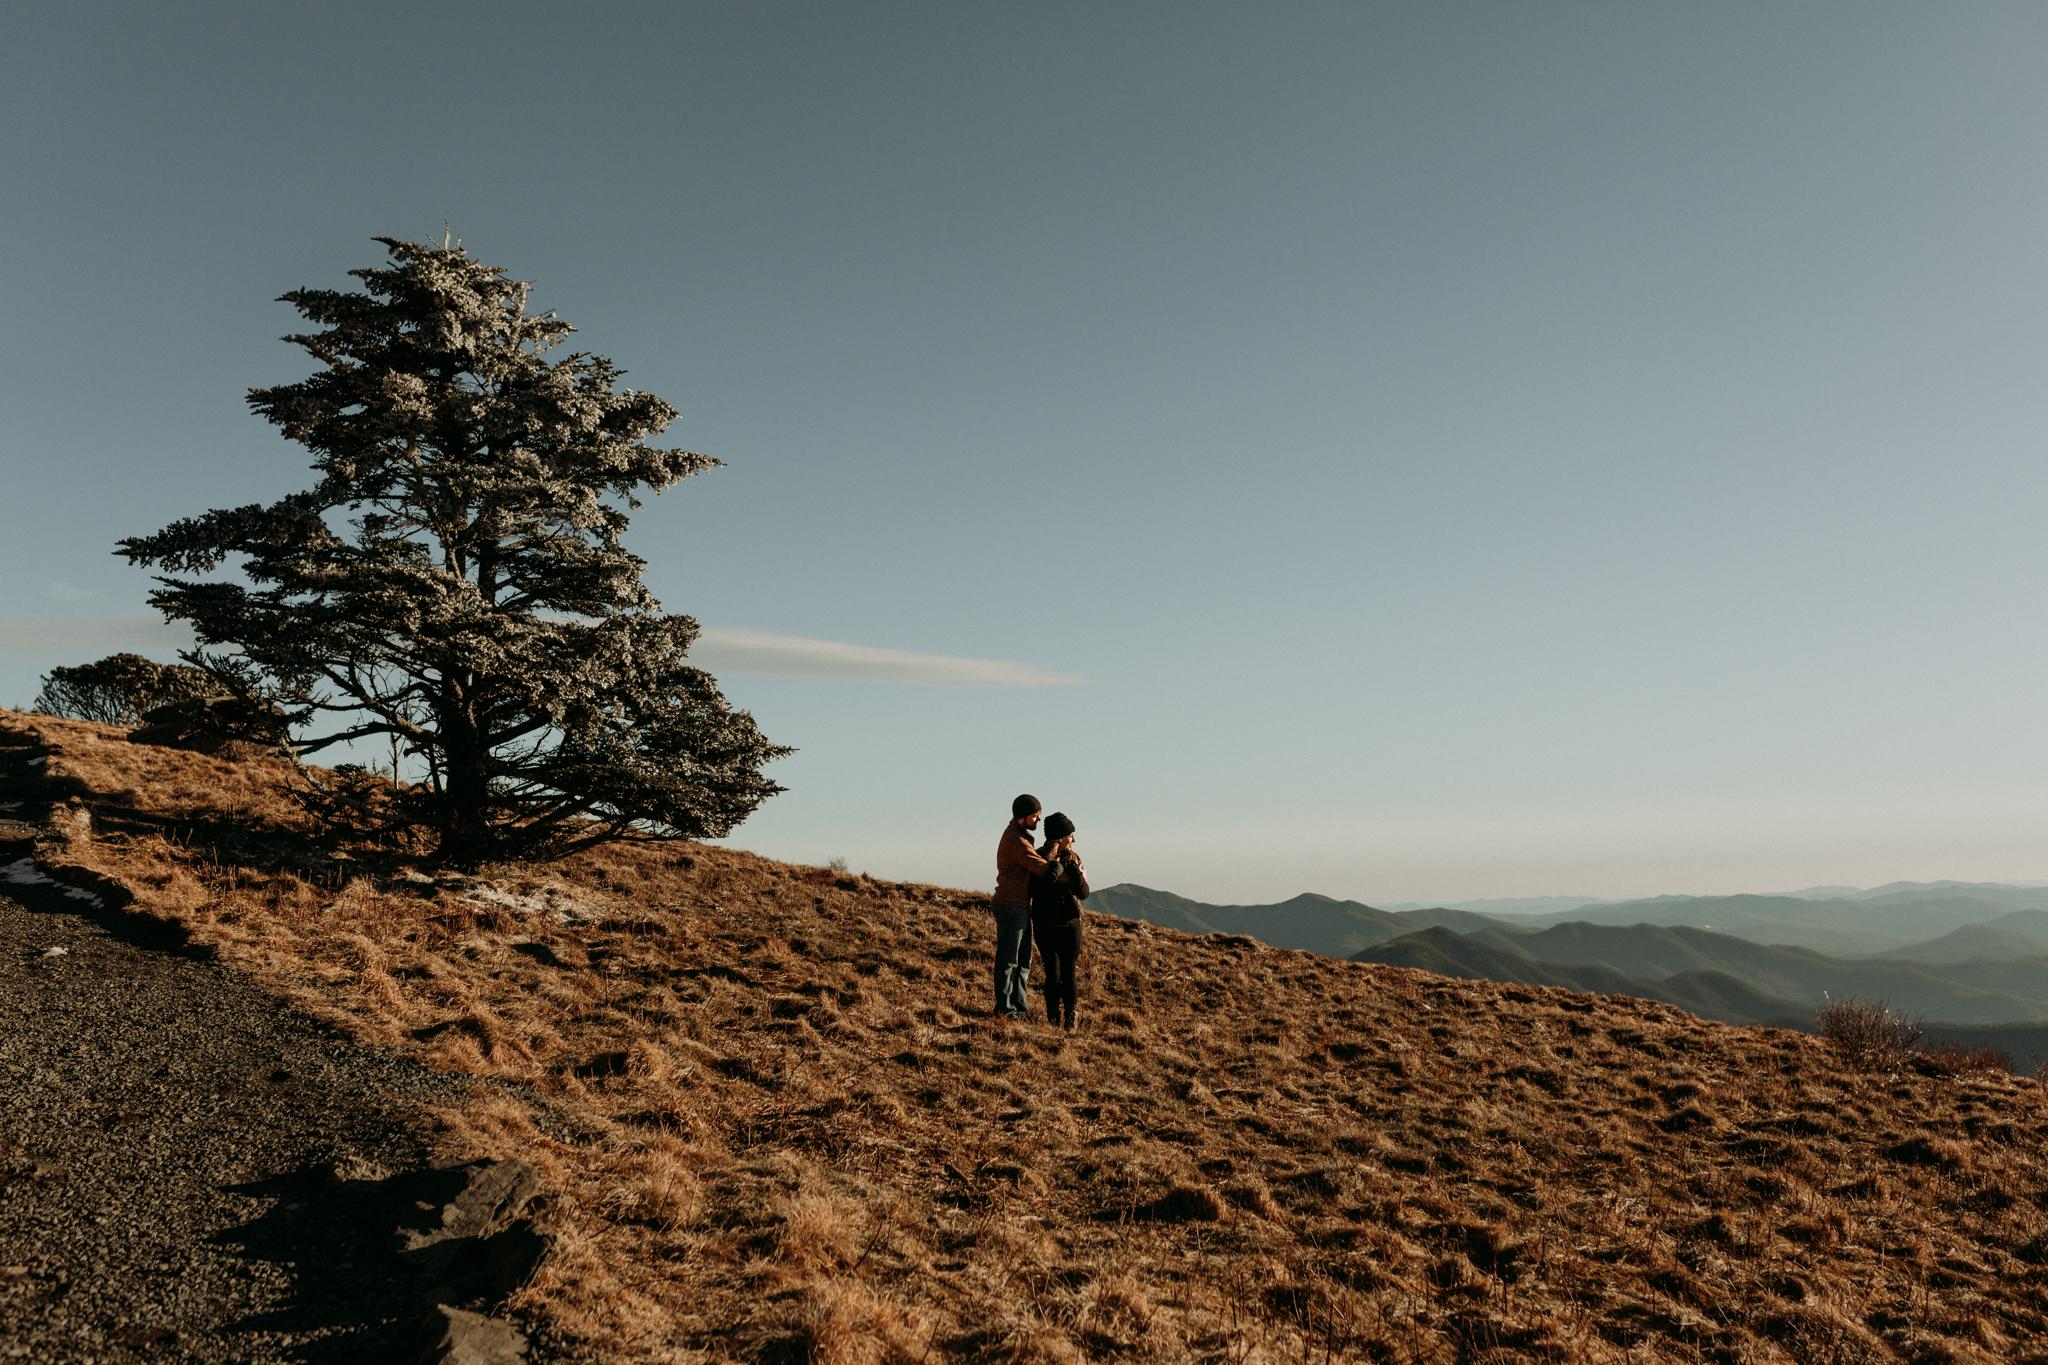 MonicaLeavellPhoto-AshleyMitch-NorthCarolina-Adventure-Engagement-Photographer-21.jpg